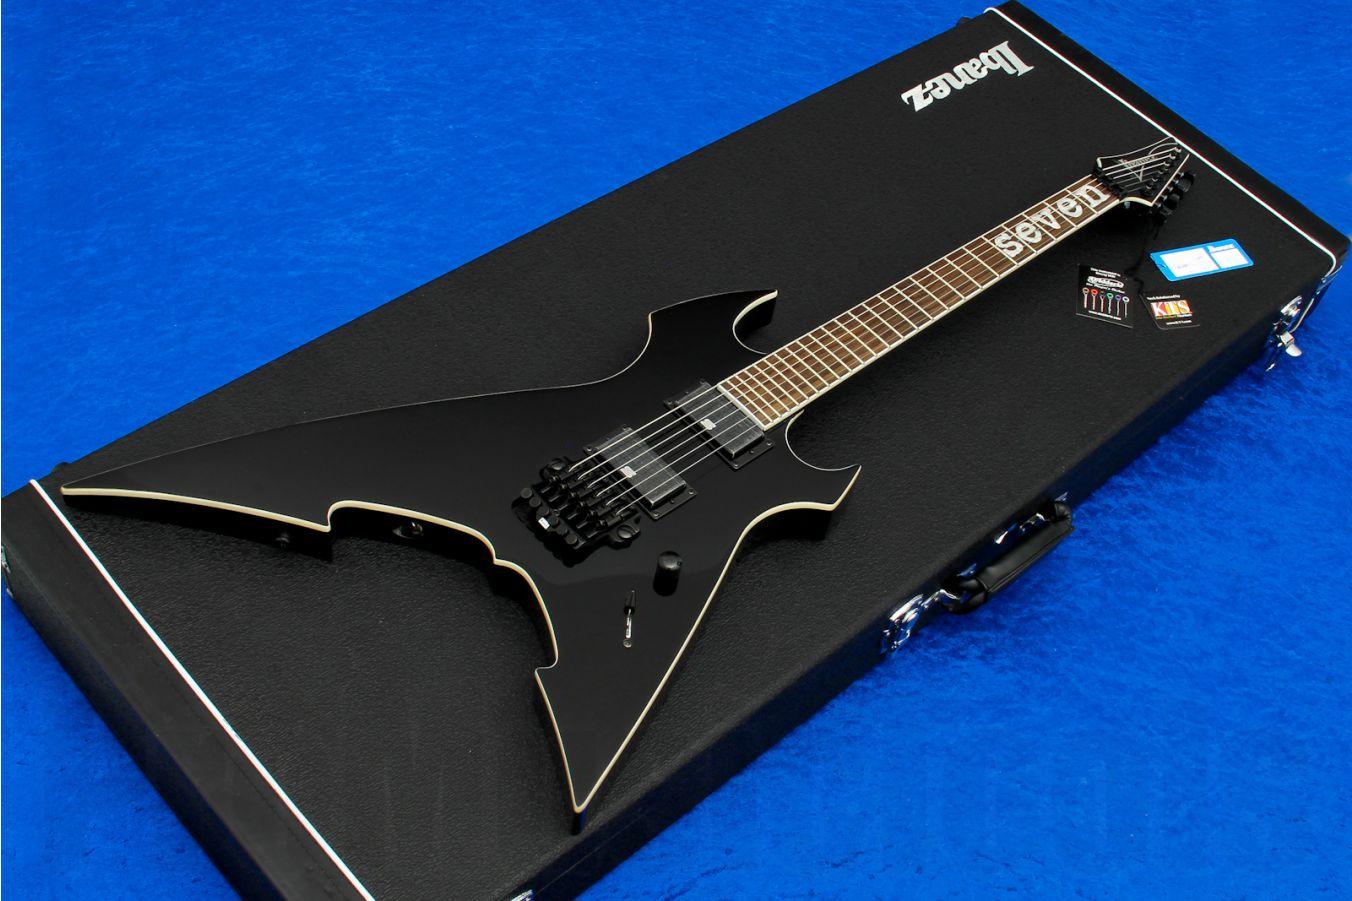 Ibanez MTM100 BK Prestige - Black  - Mick Thomson Signature - b-stock (1x opened box)